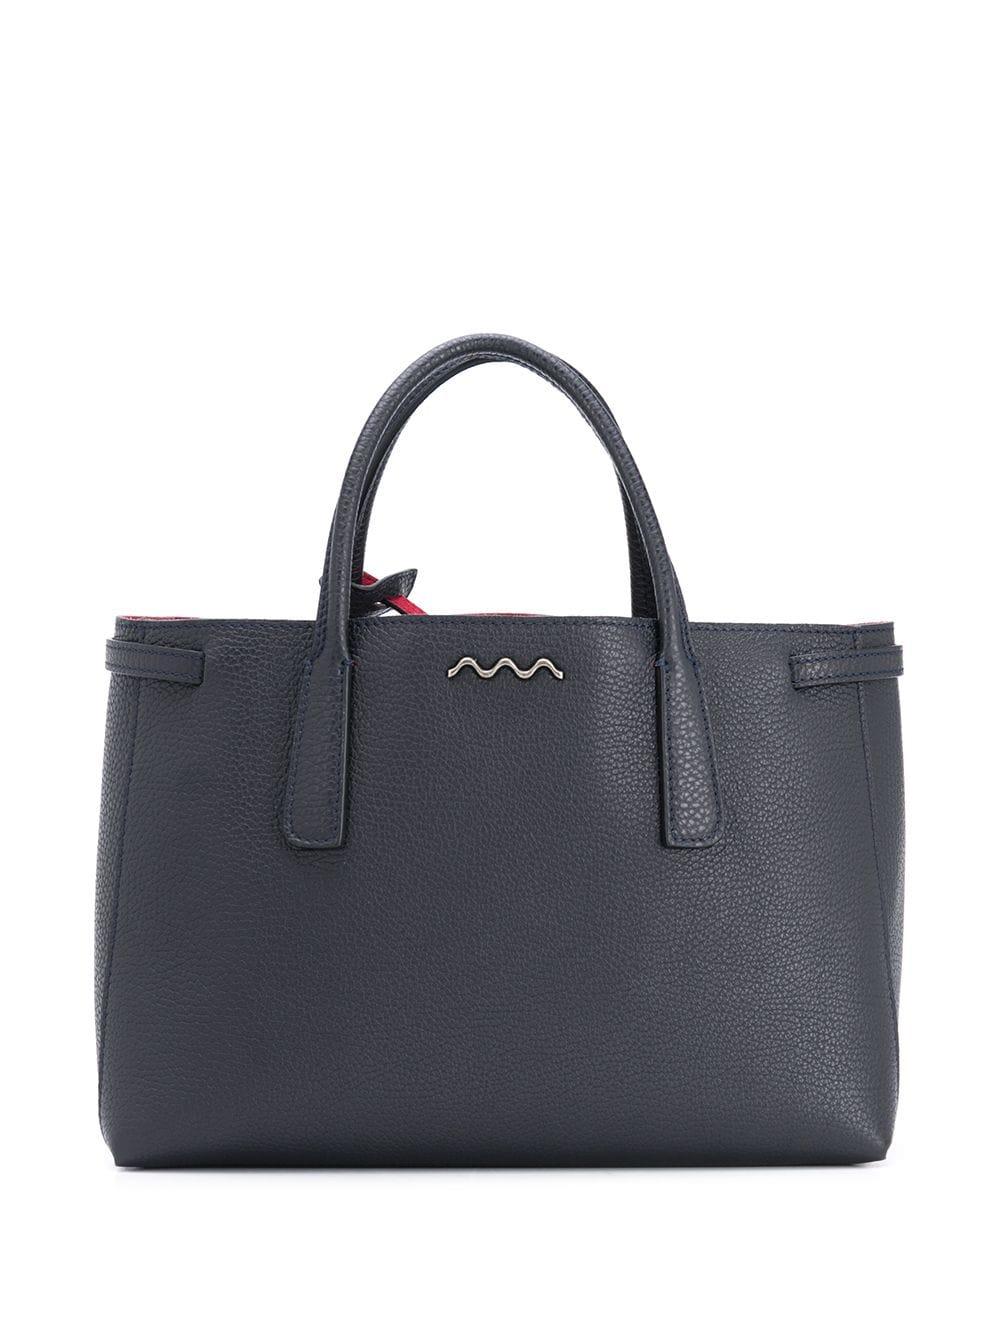 Duo Metropolitan Small Leather Bag